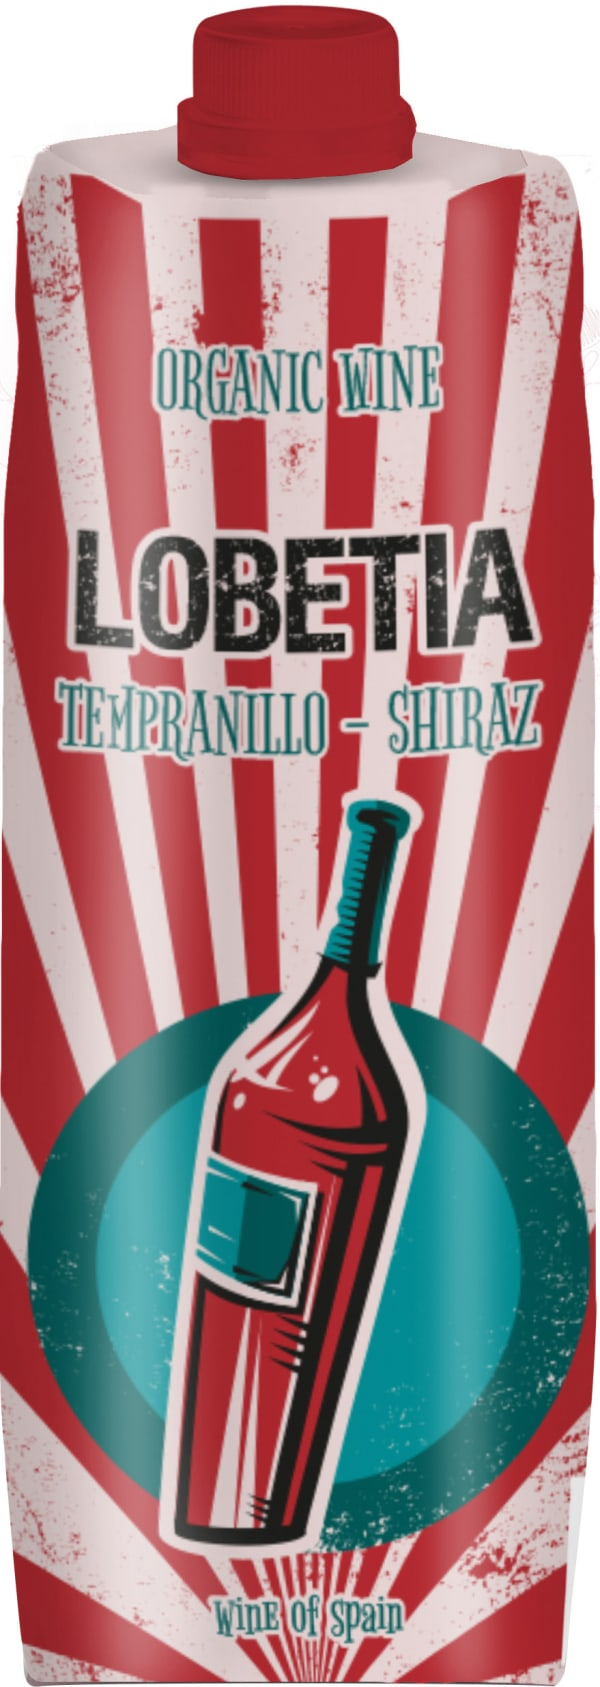 Lobetia Tempranillo Shiraz 2019 kartongförpackning